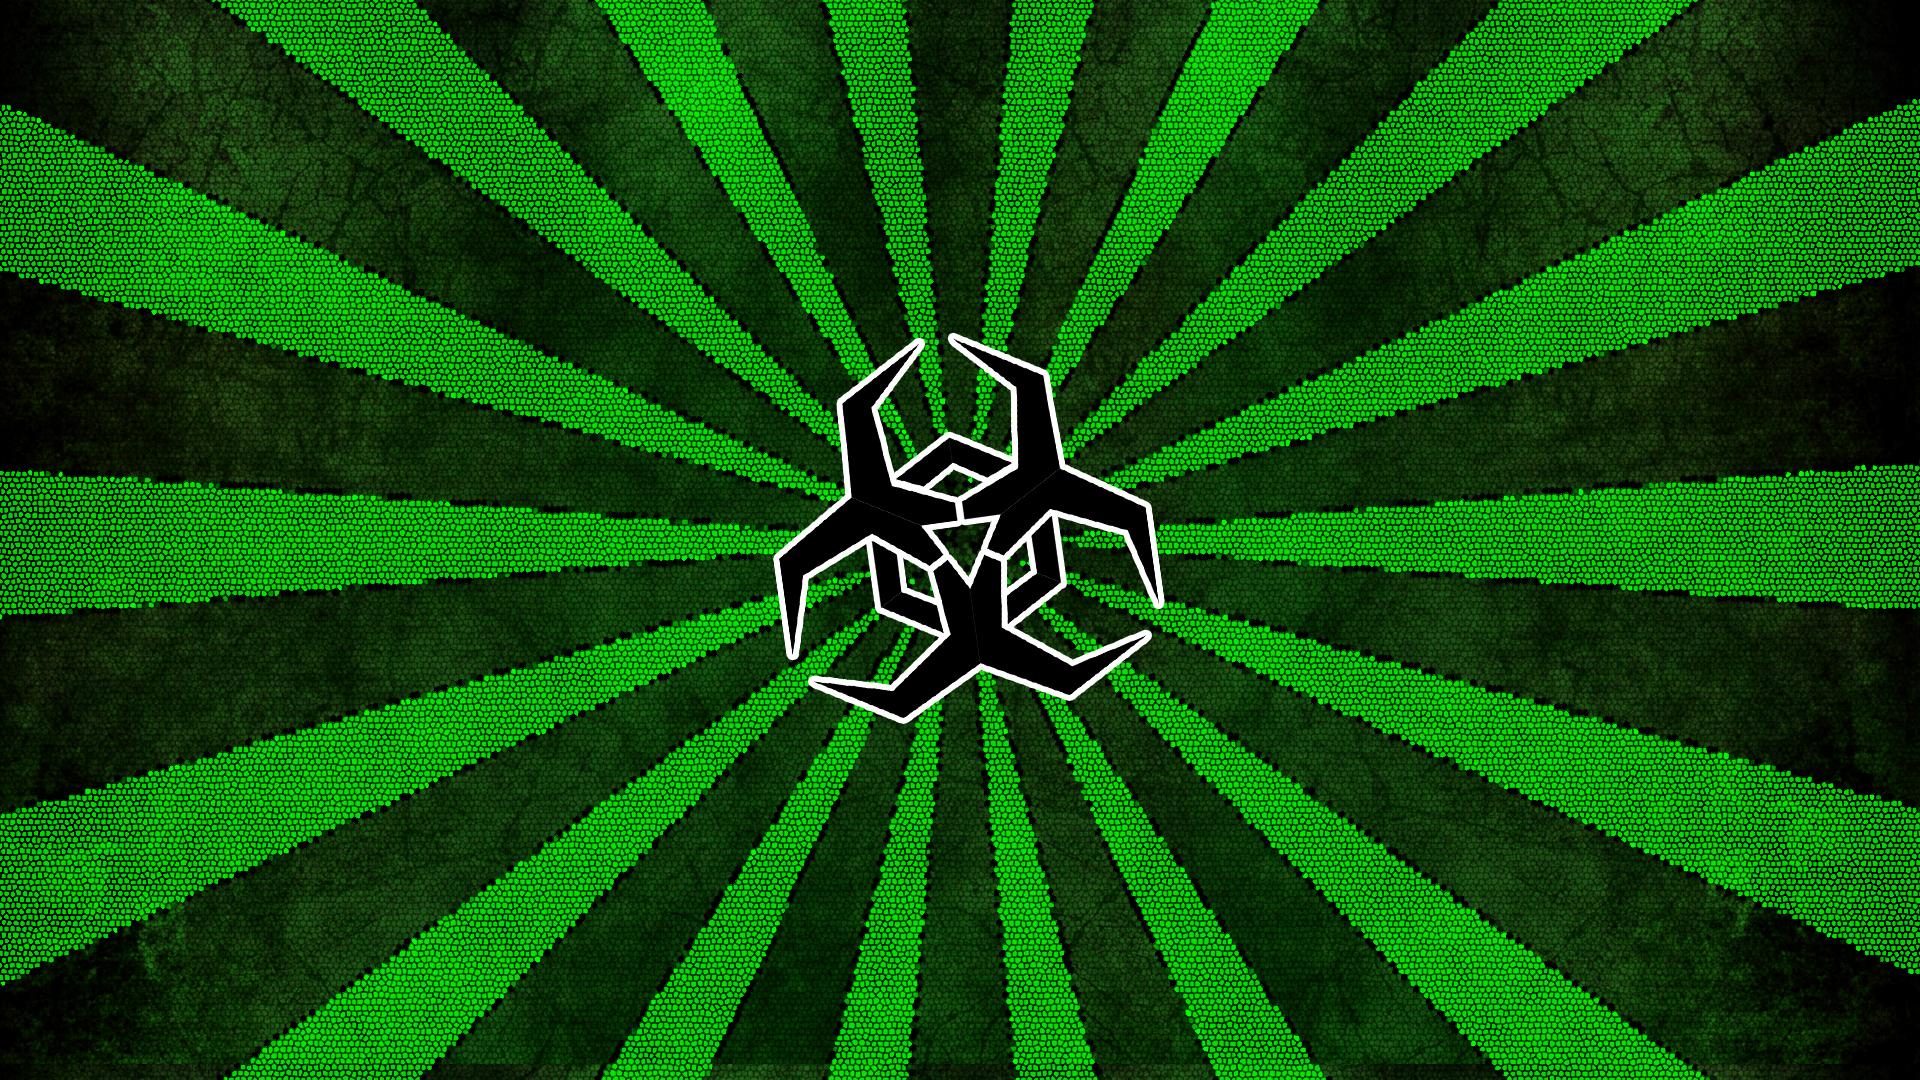 Country Quotes Wallpaper Biohazard Symbol Background Download Free Pixelstalk Net